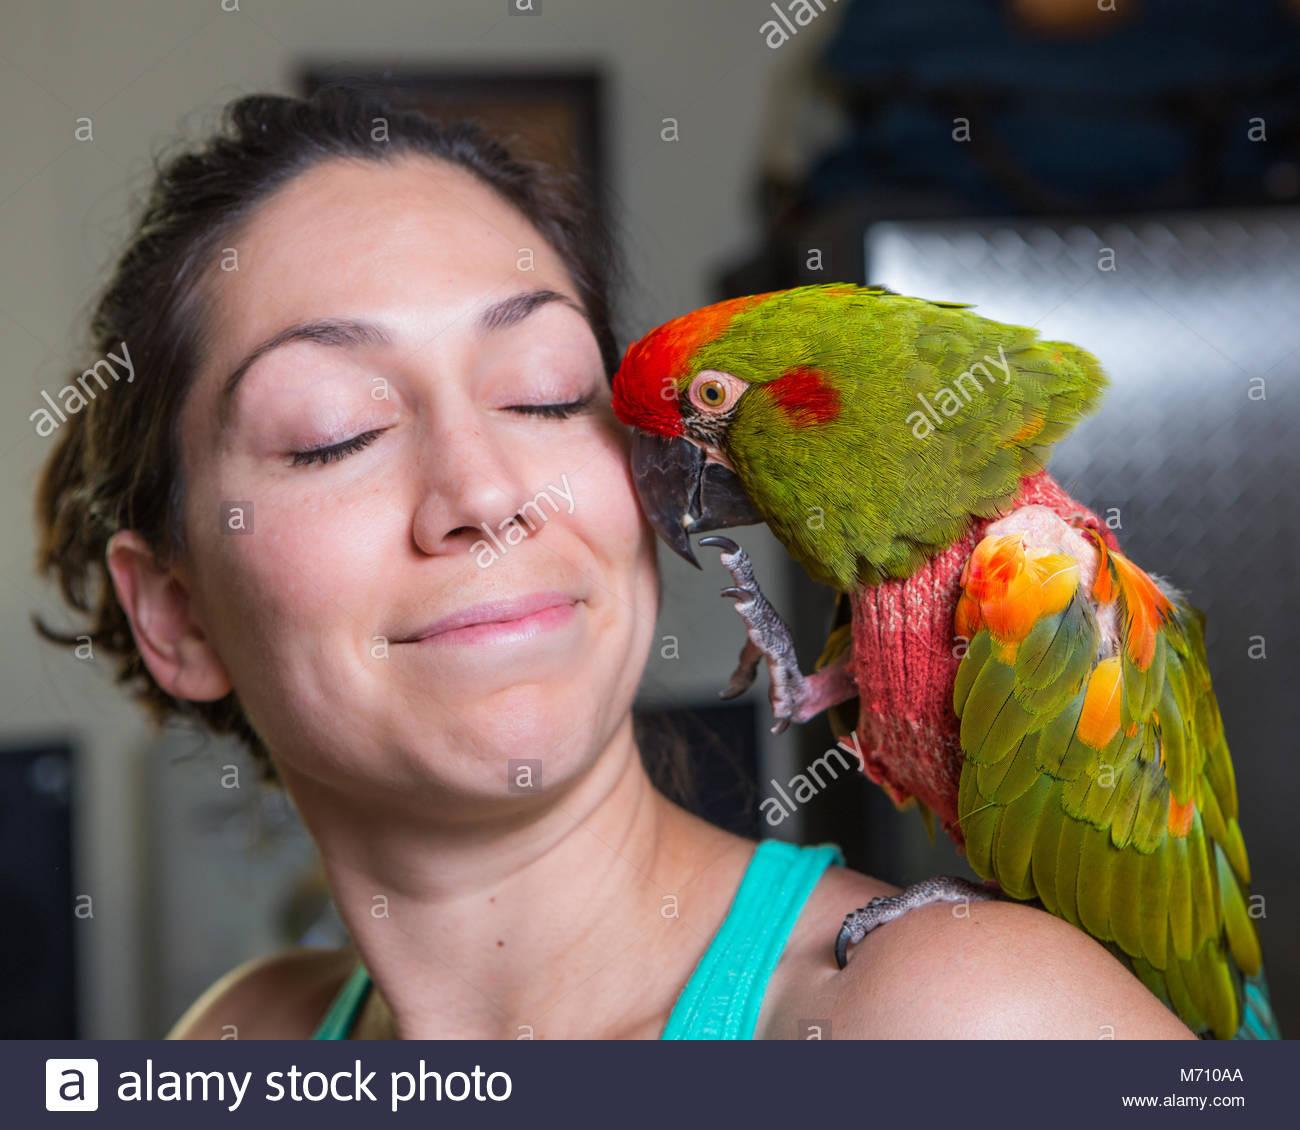 woman macaw stockfotos woman macaw bilder alamy. Black Bedroom Furniture Sets. Home Design Ideas